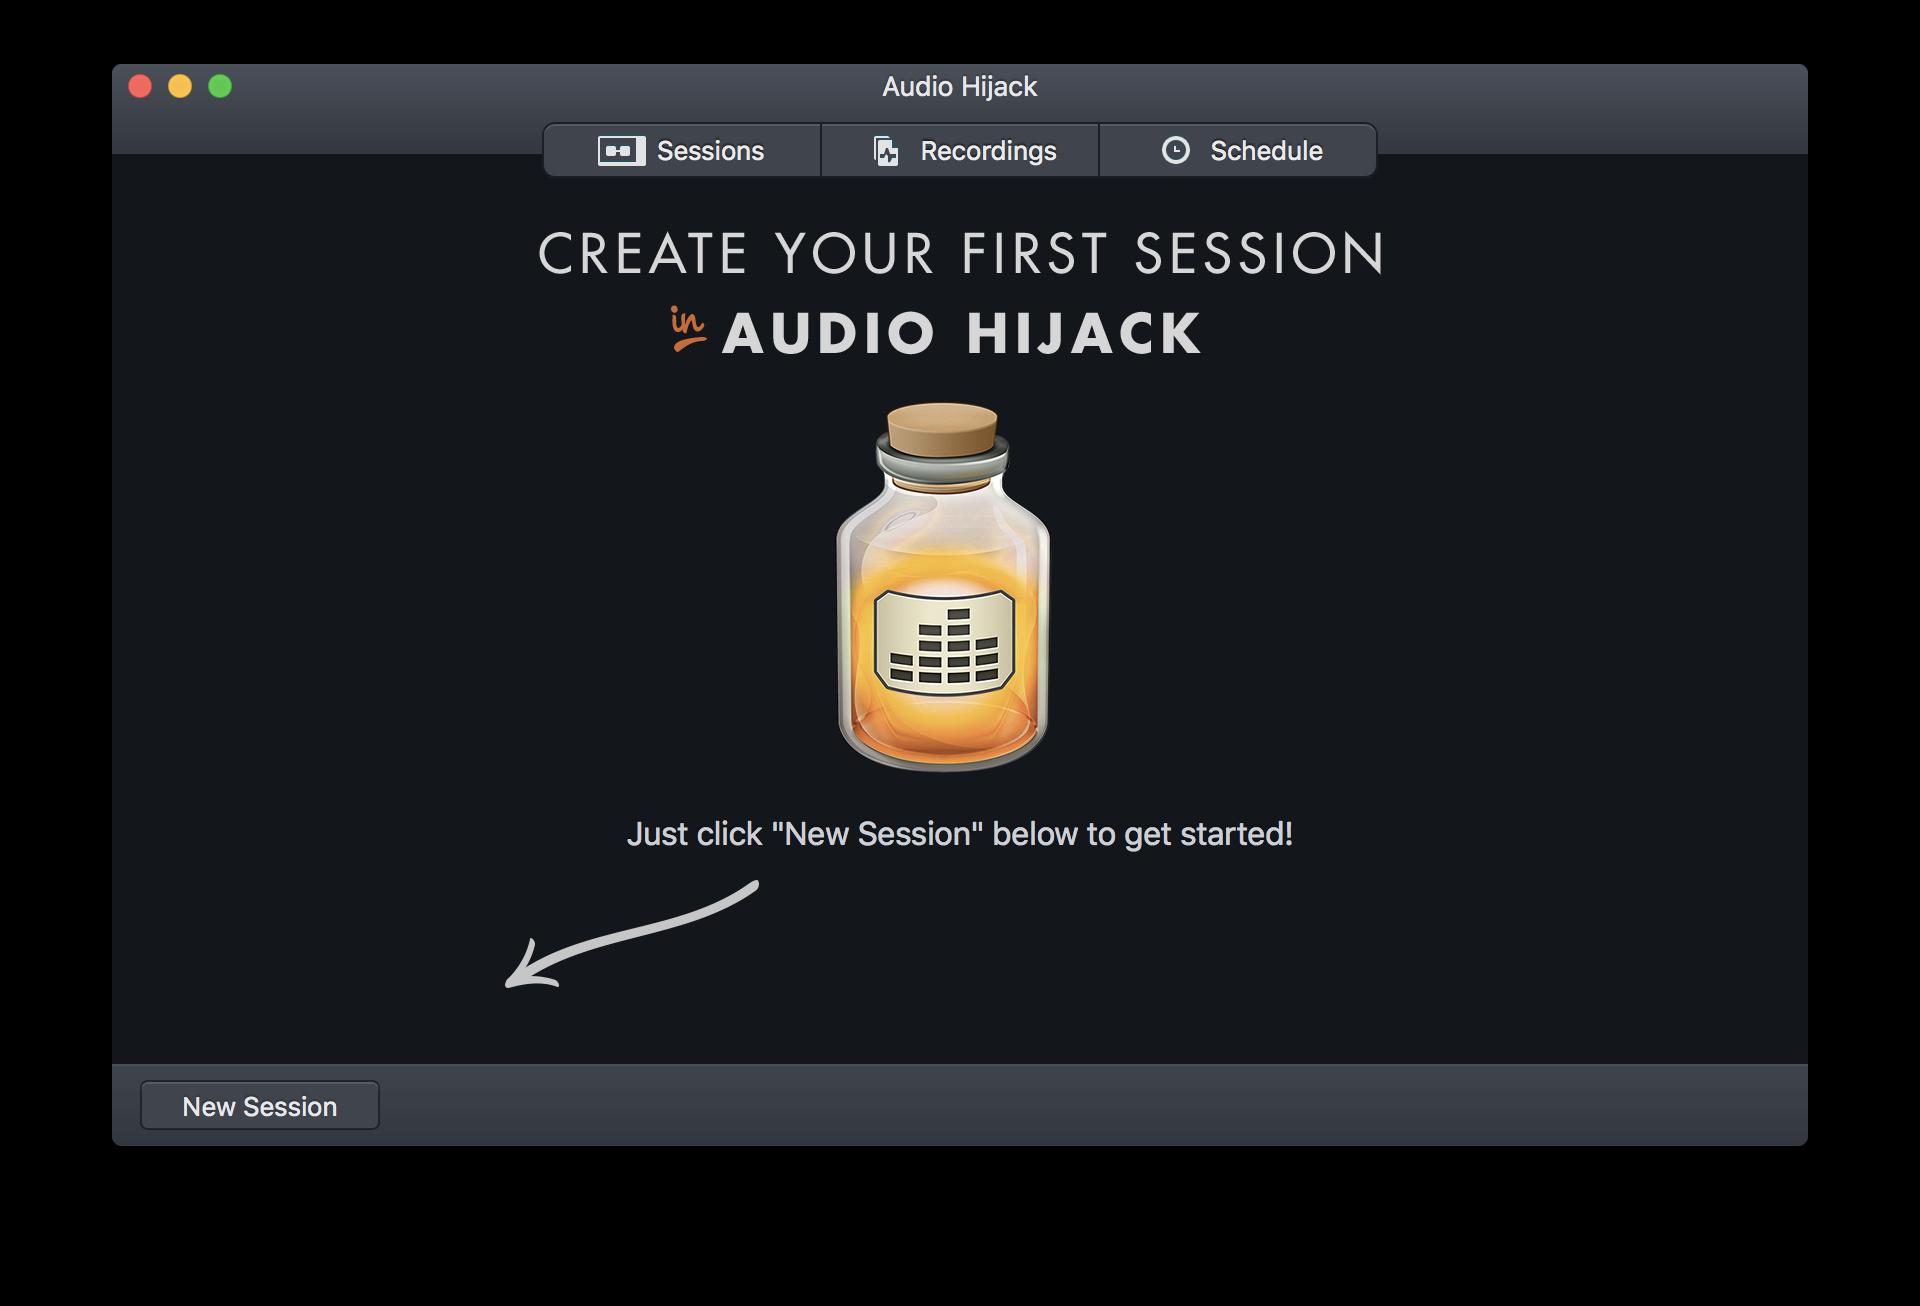 Audio Hijack welcome screen.